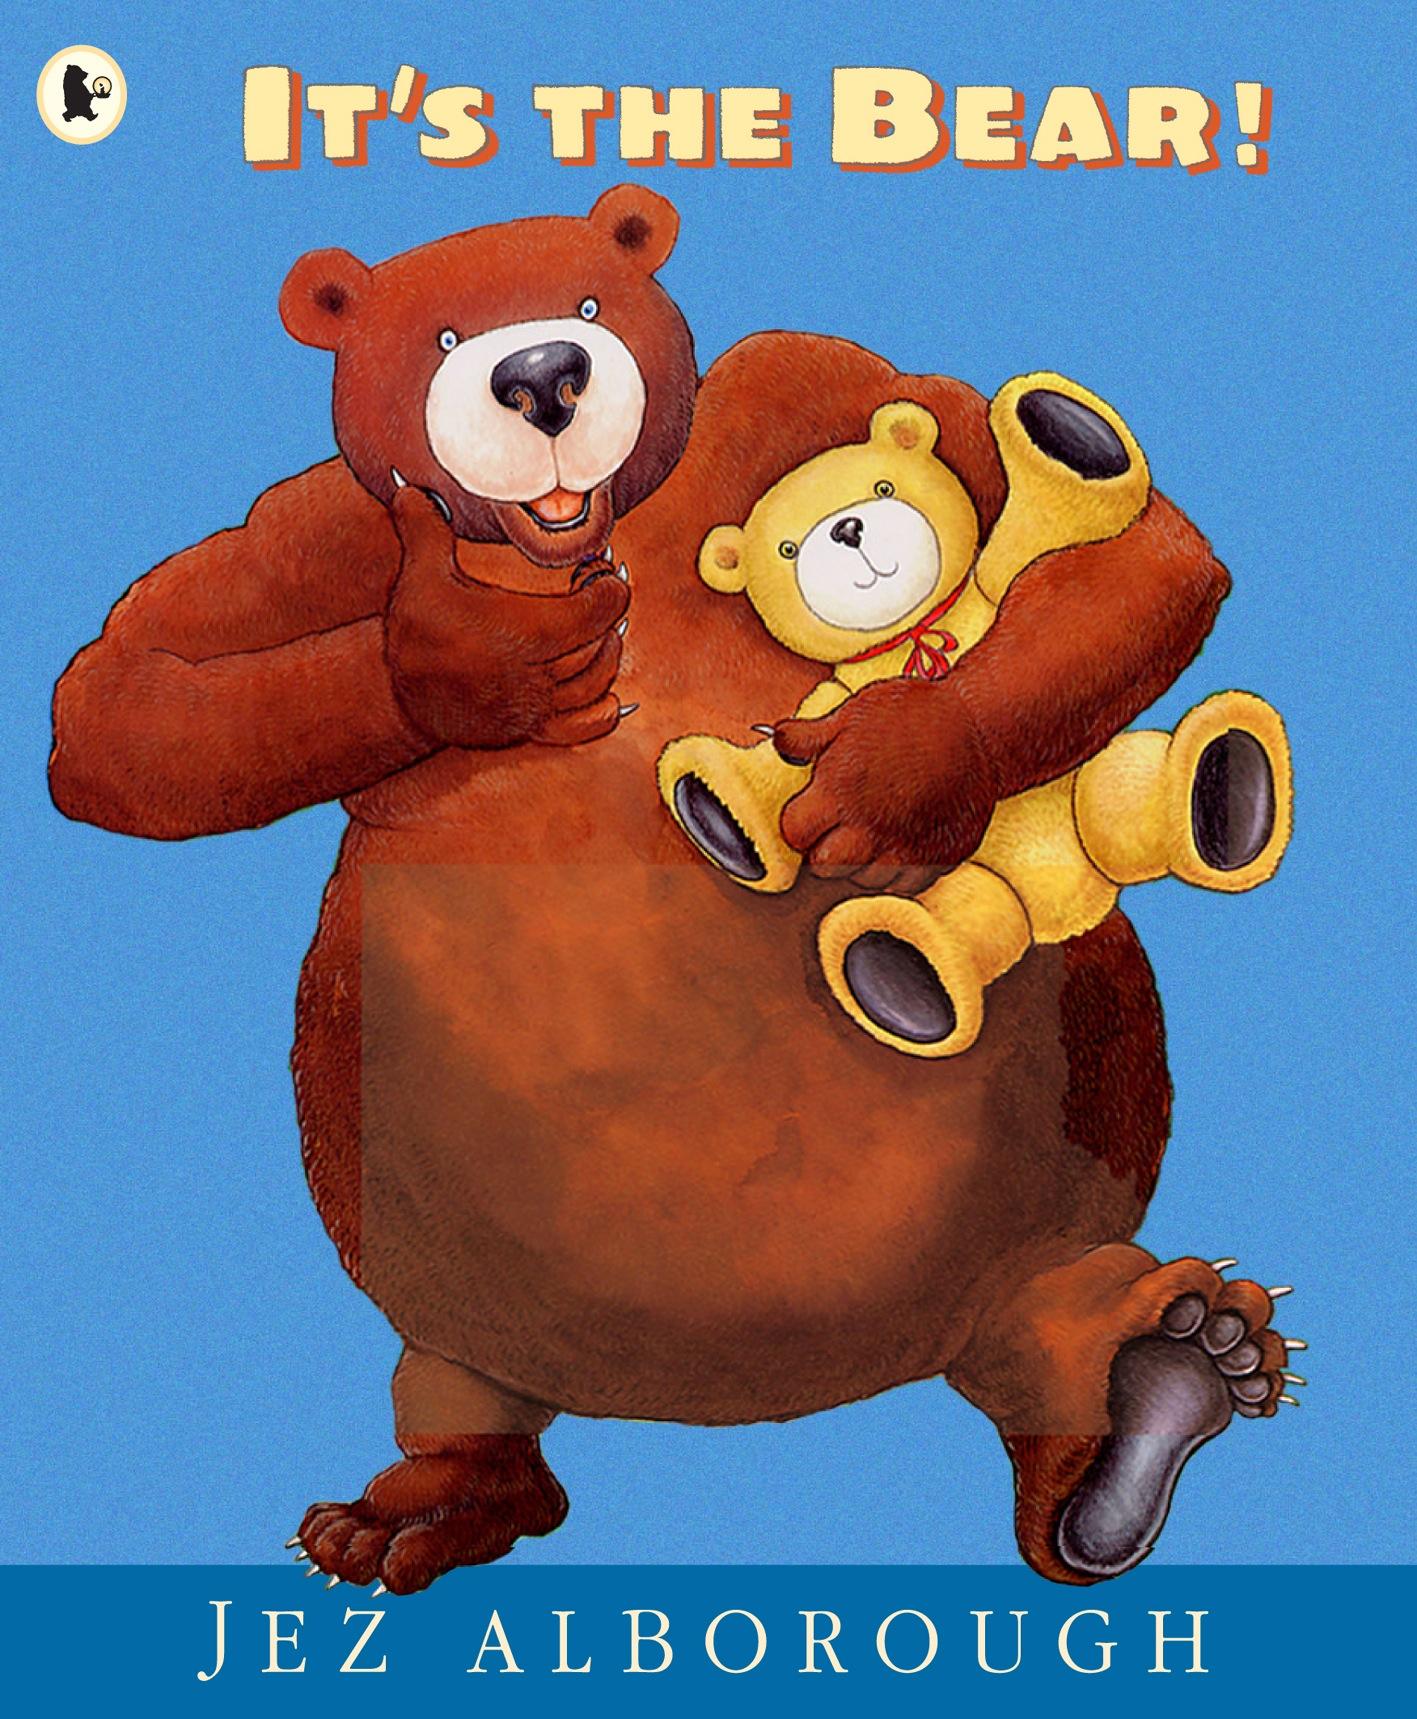 jezalborough com it s the bear